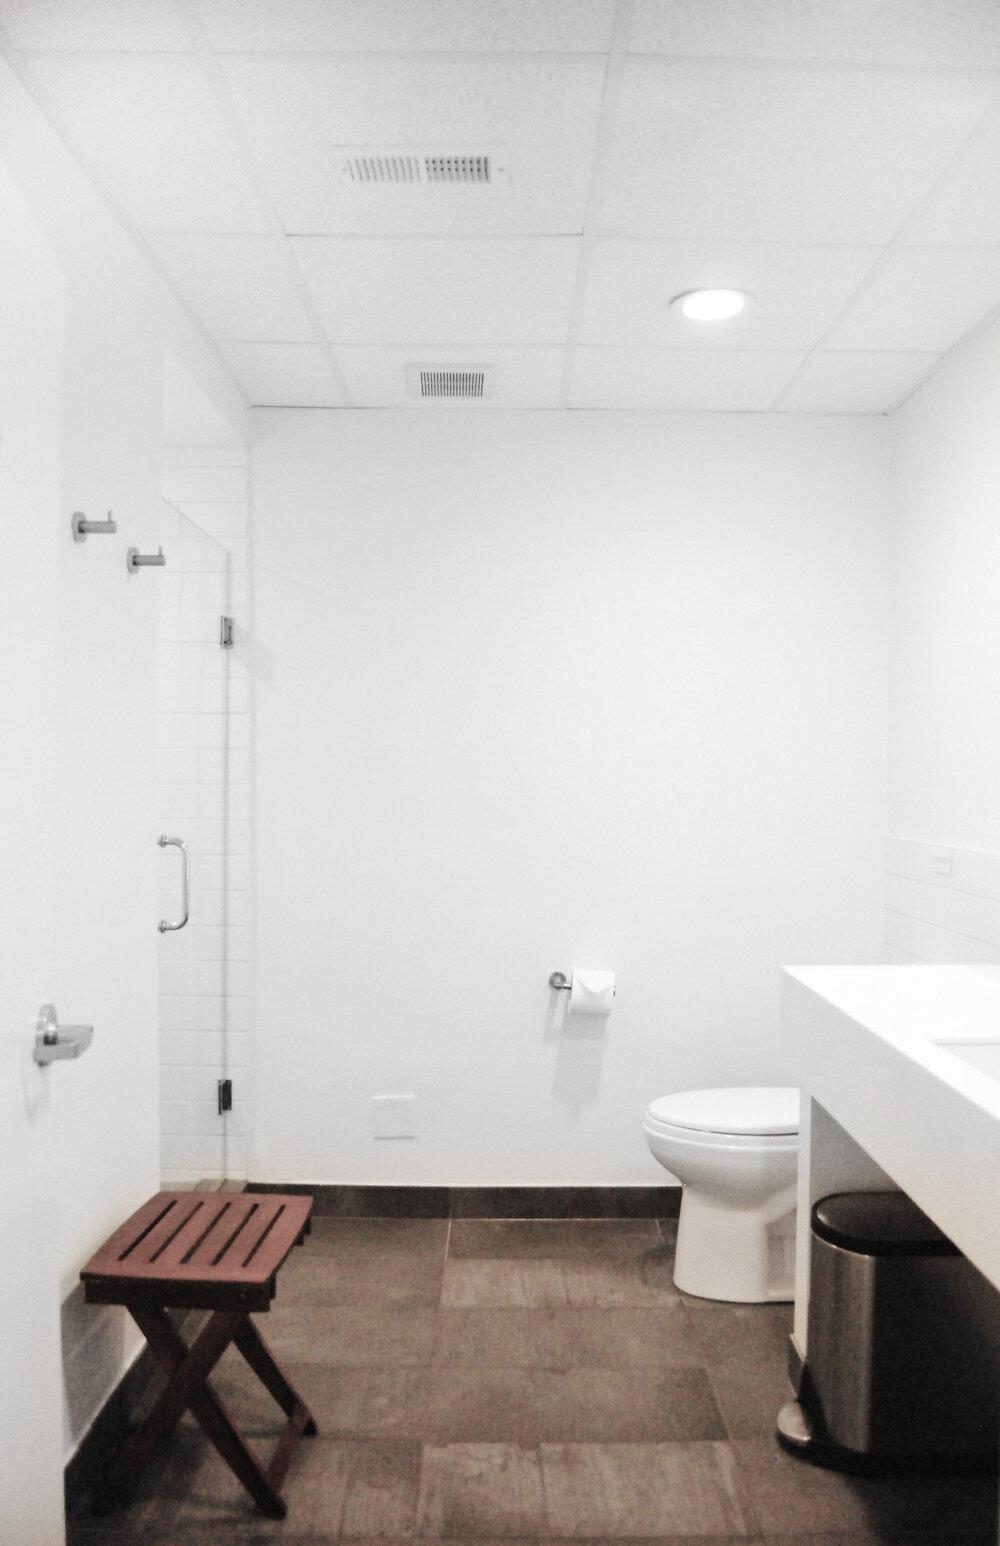 Private+Restroom+1.jpg